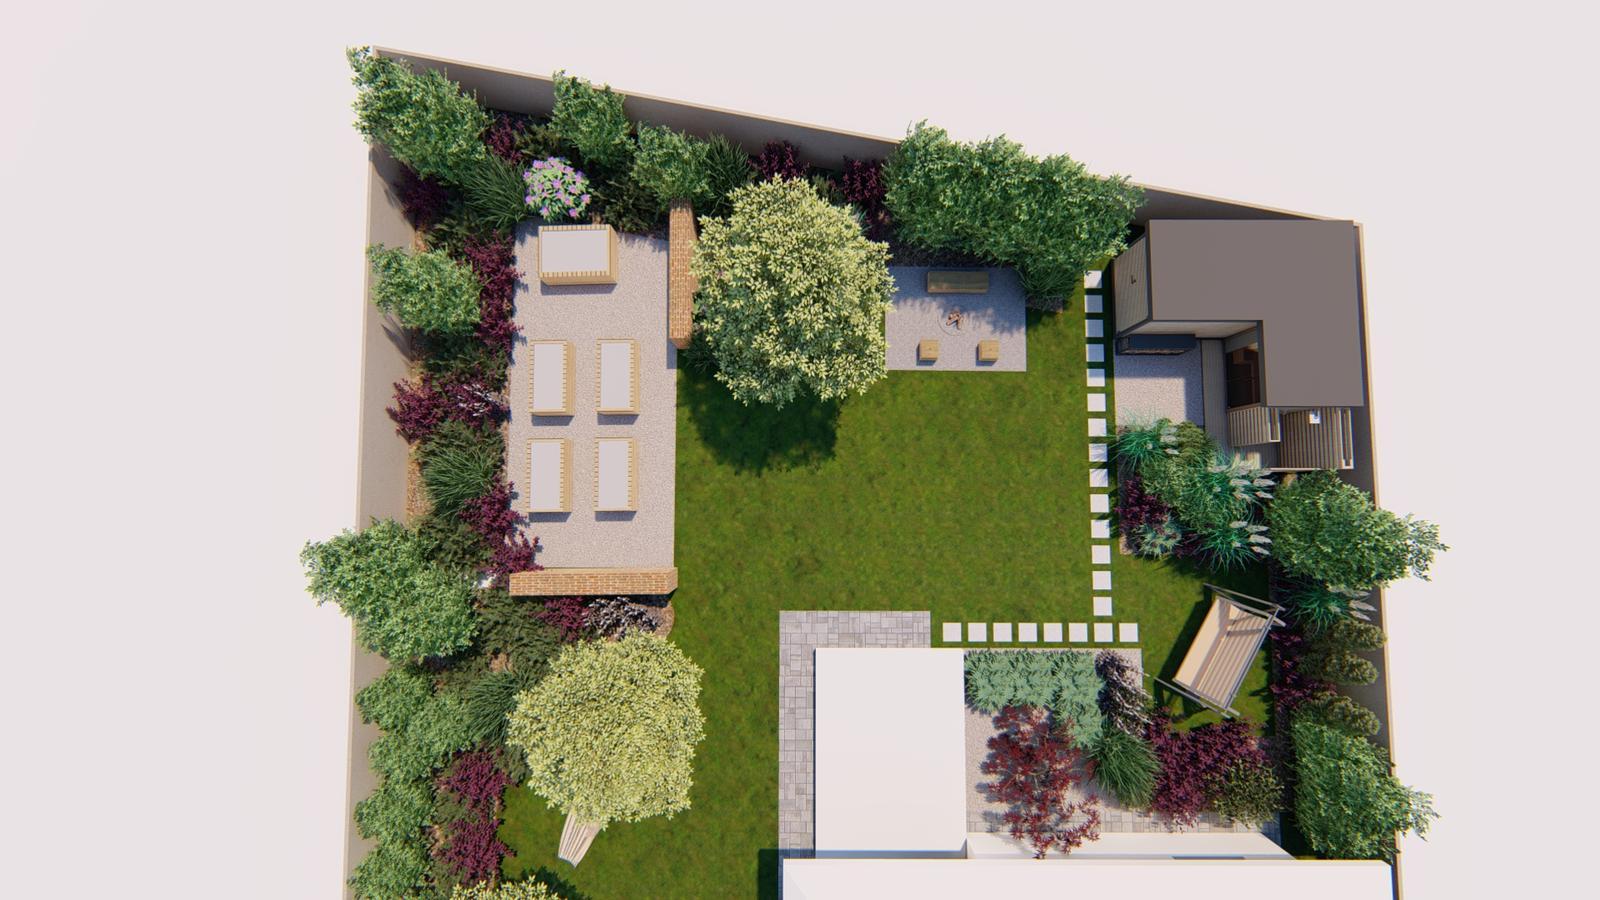 Návrh záhrady rodinného domu - Obrázok č. 24